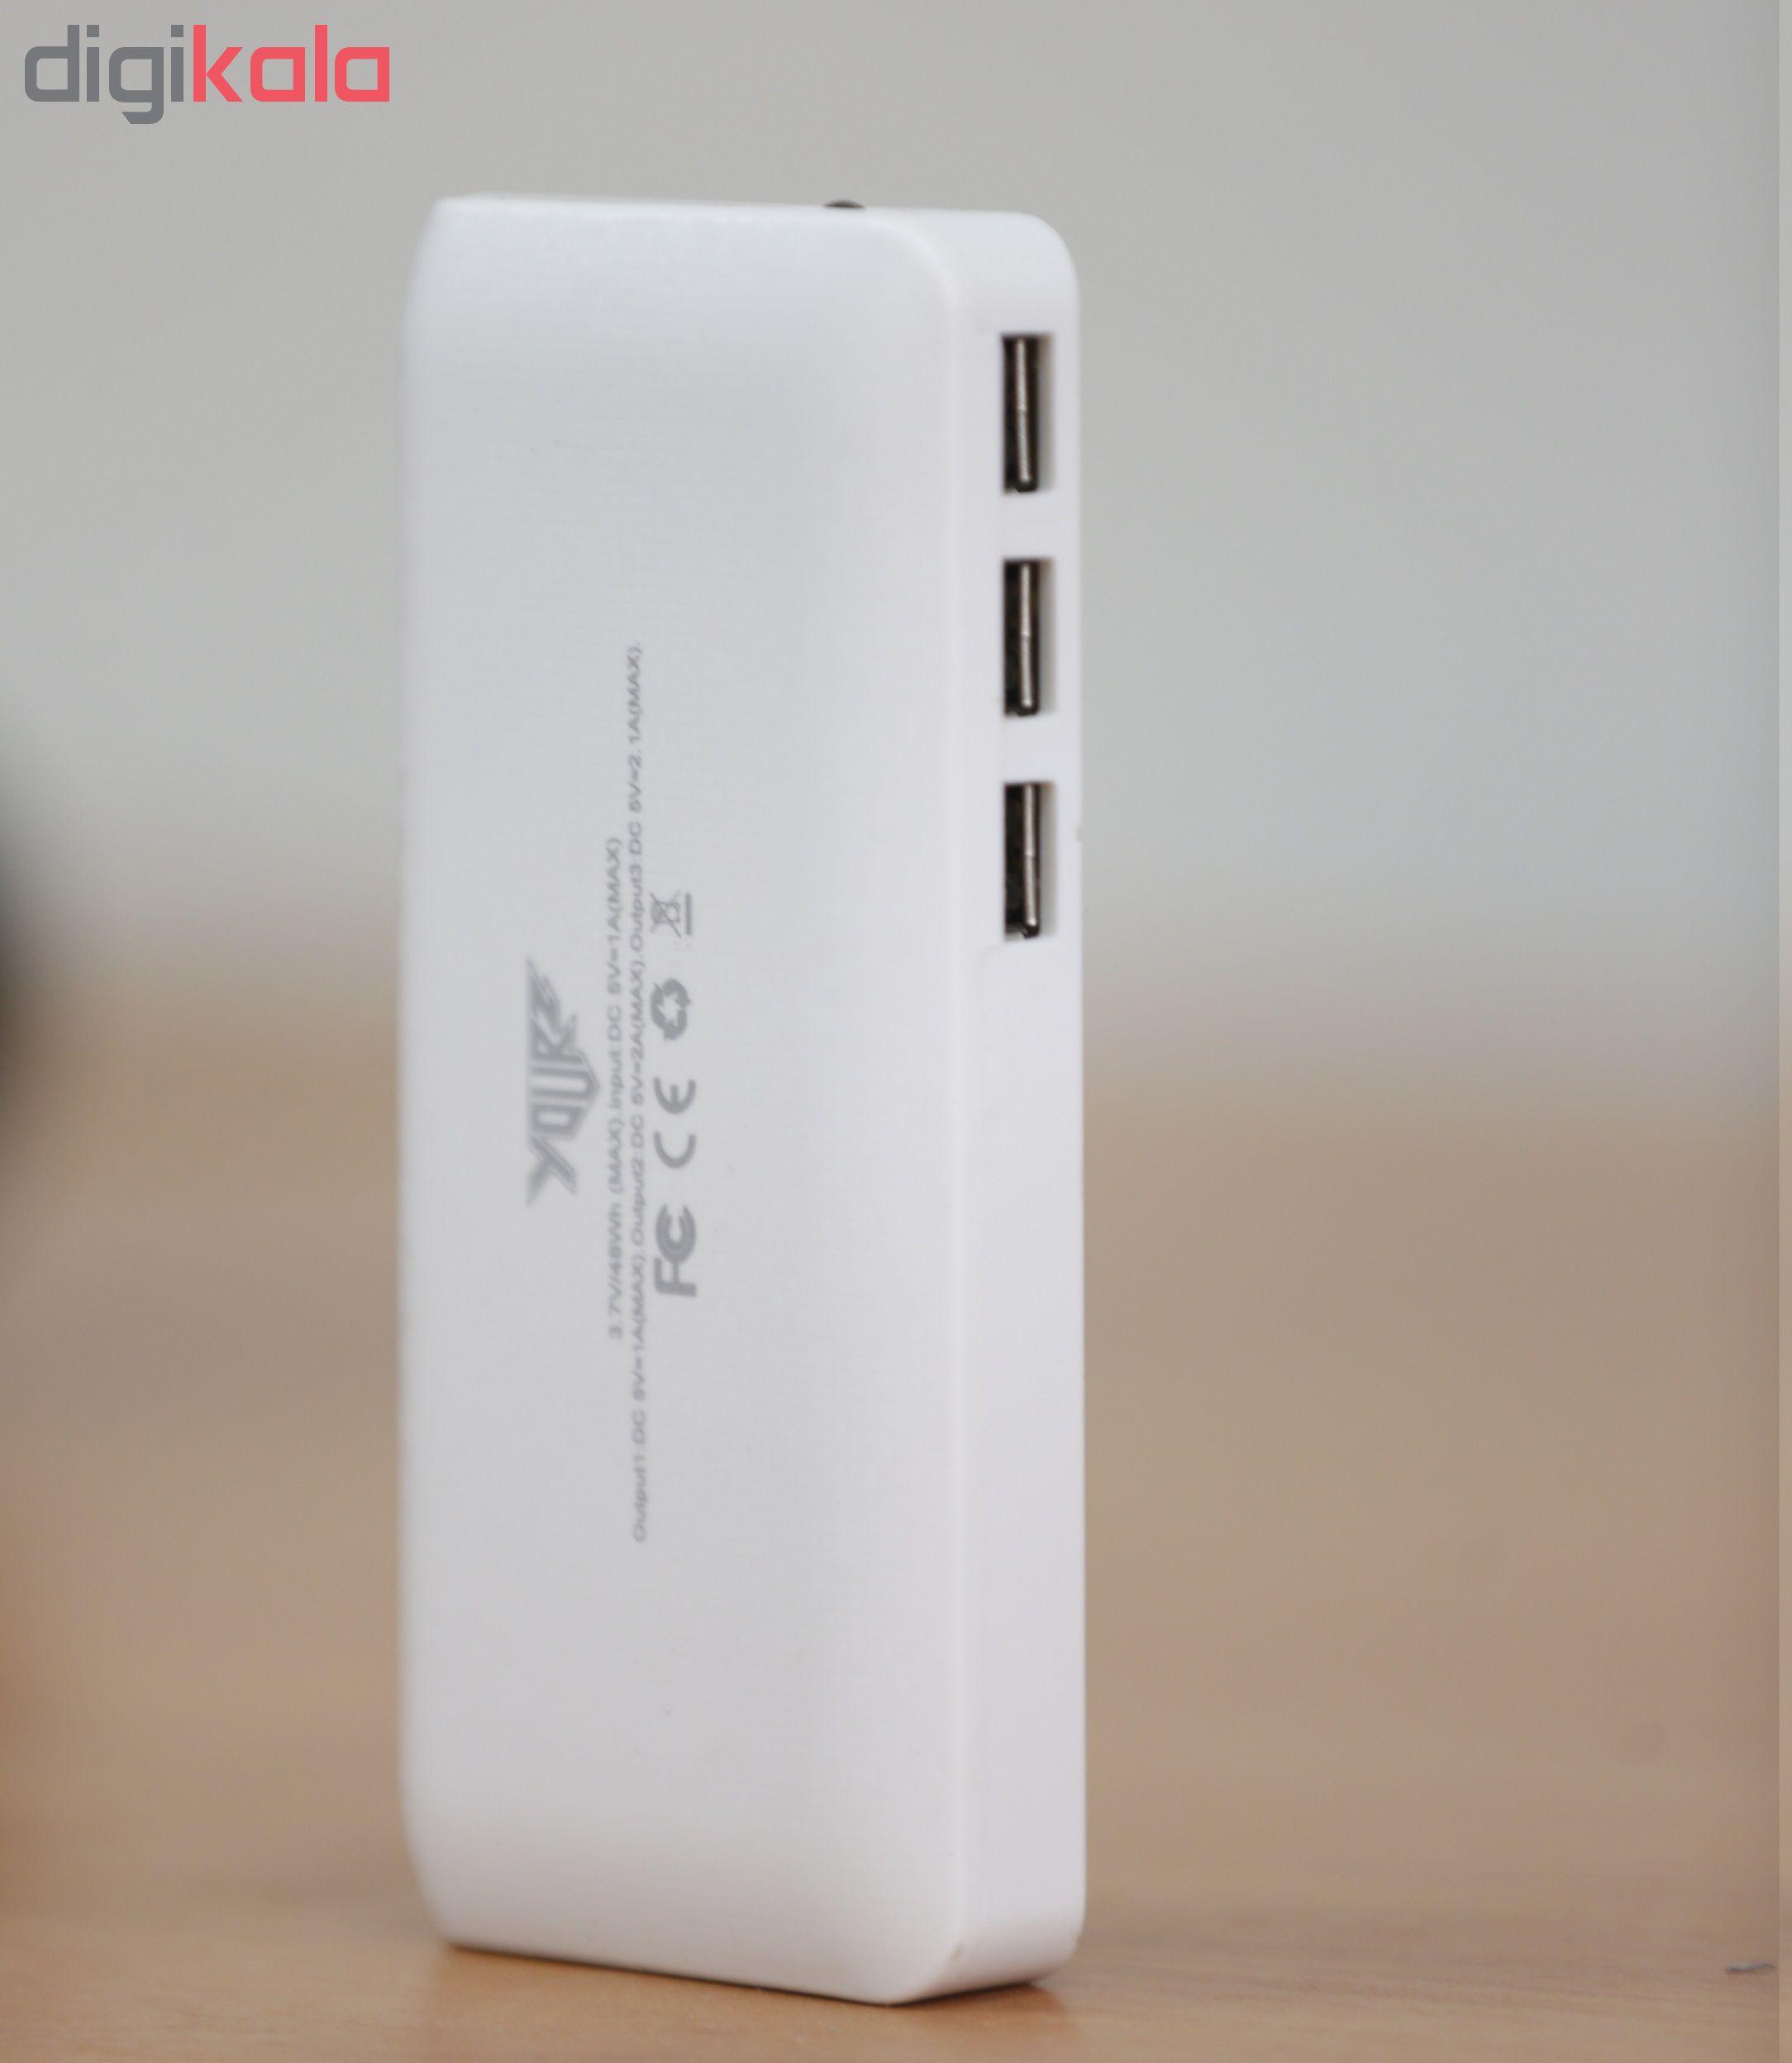 شارژر همراه کد 20000 ظرفیت 10000 میلی آمپر ساعت